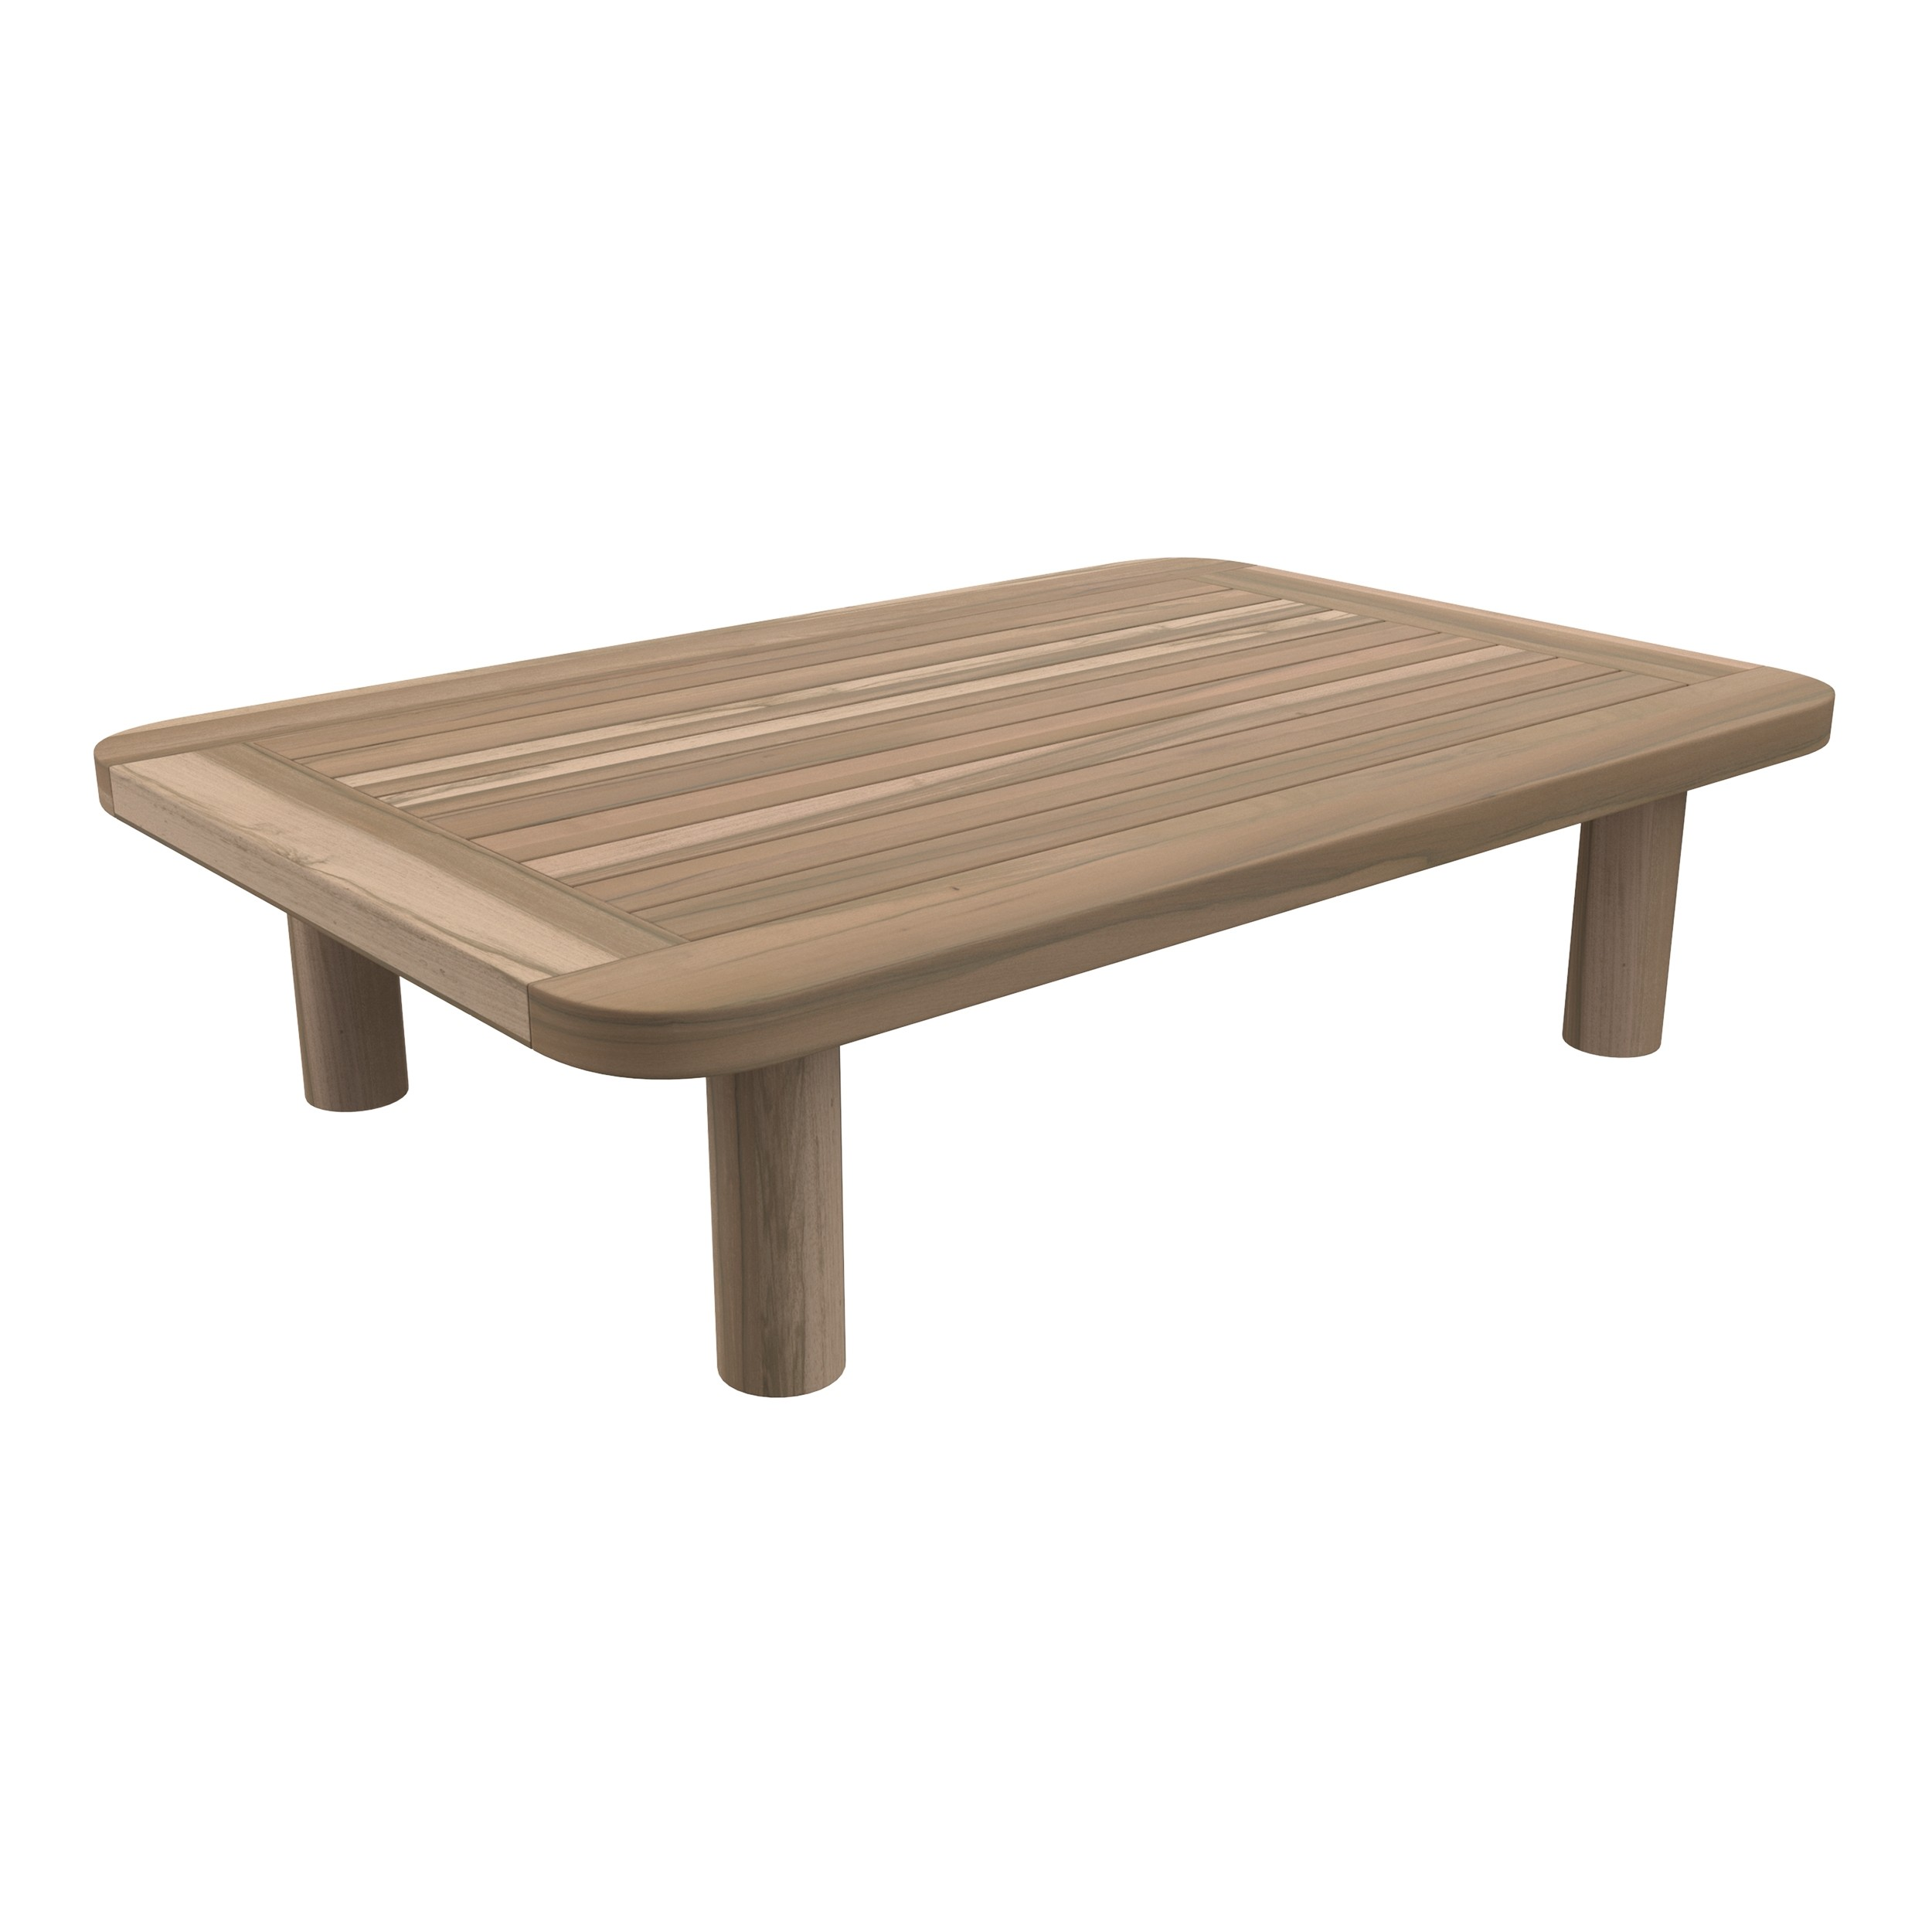 acheter table basse rectangulaire